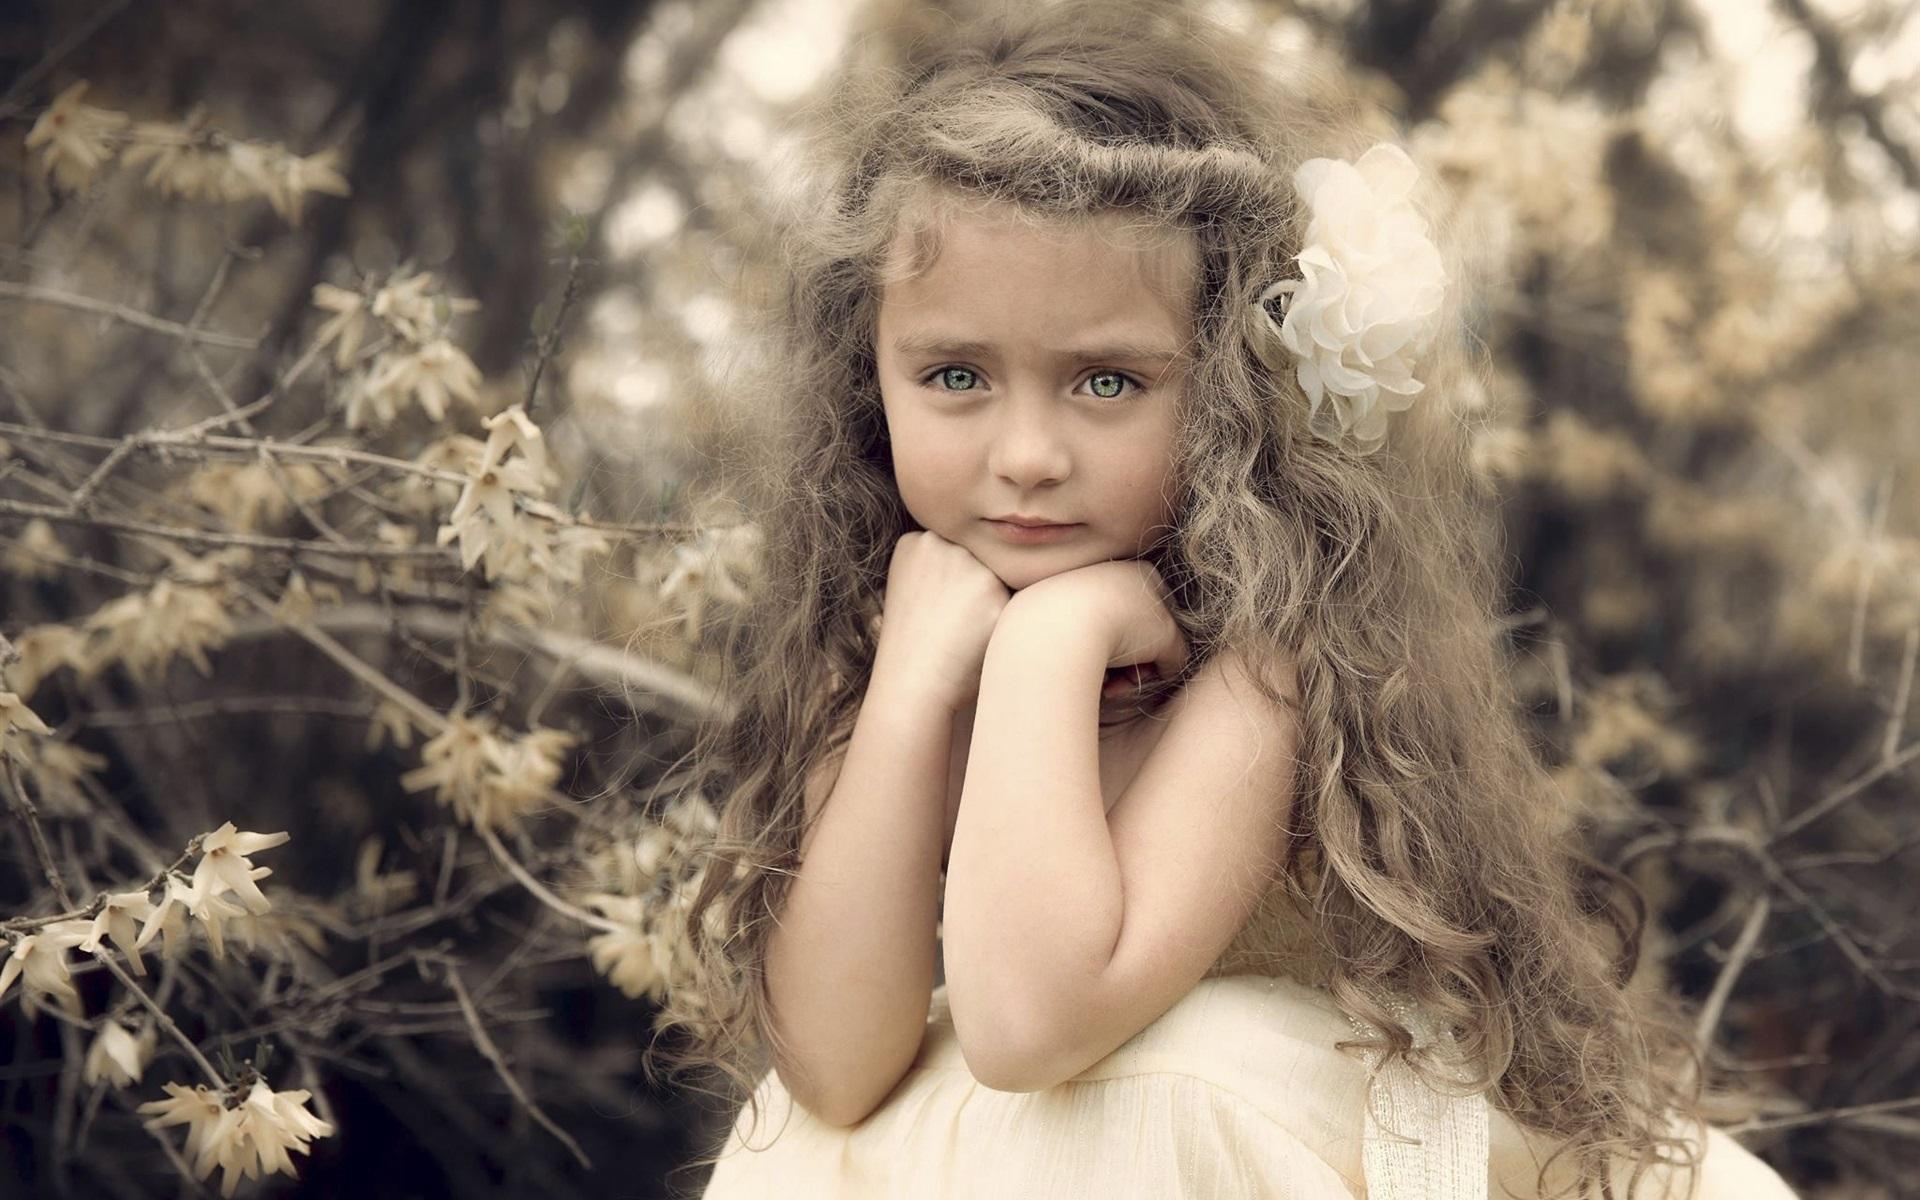 Wallpaper Beautiful Cute Girl Portrait Curls Flower 1920x1200 Hd Picture Image